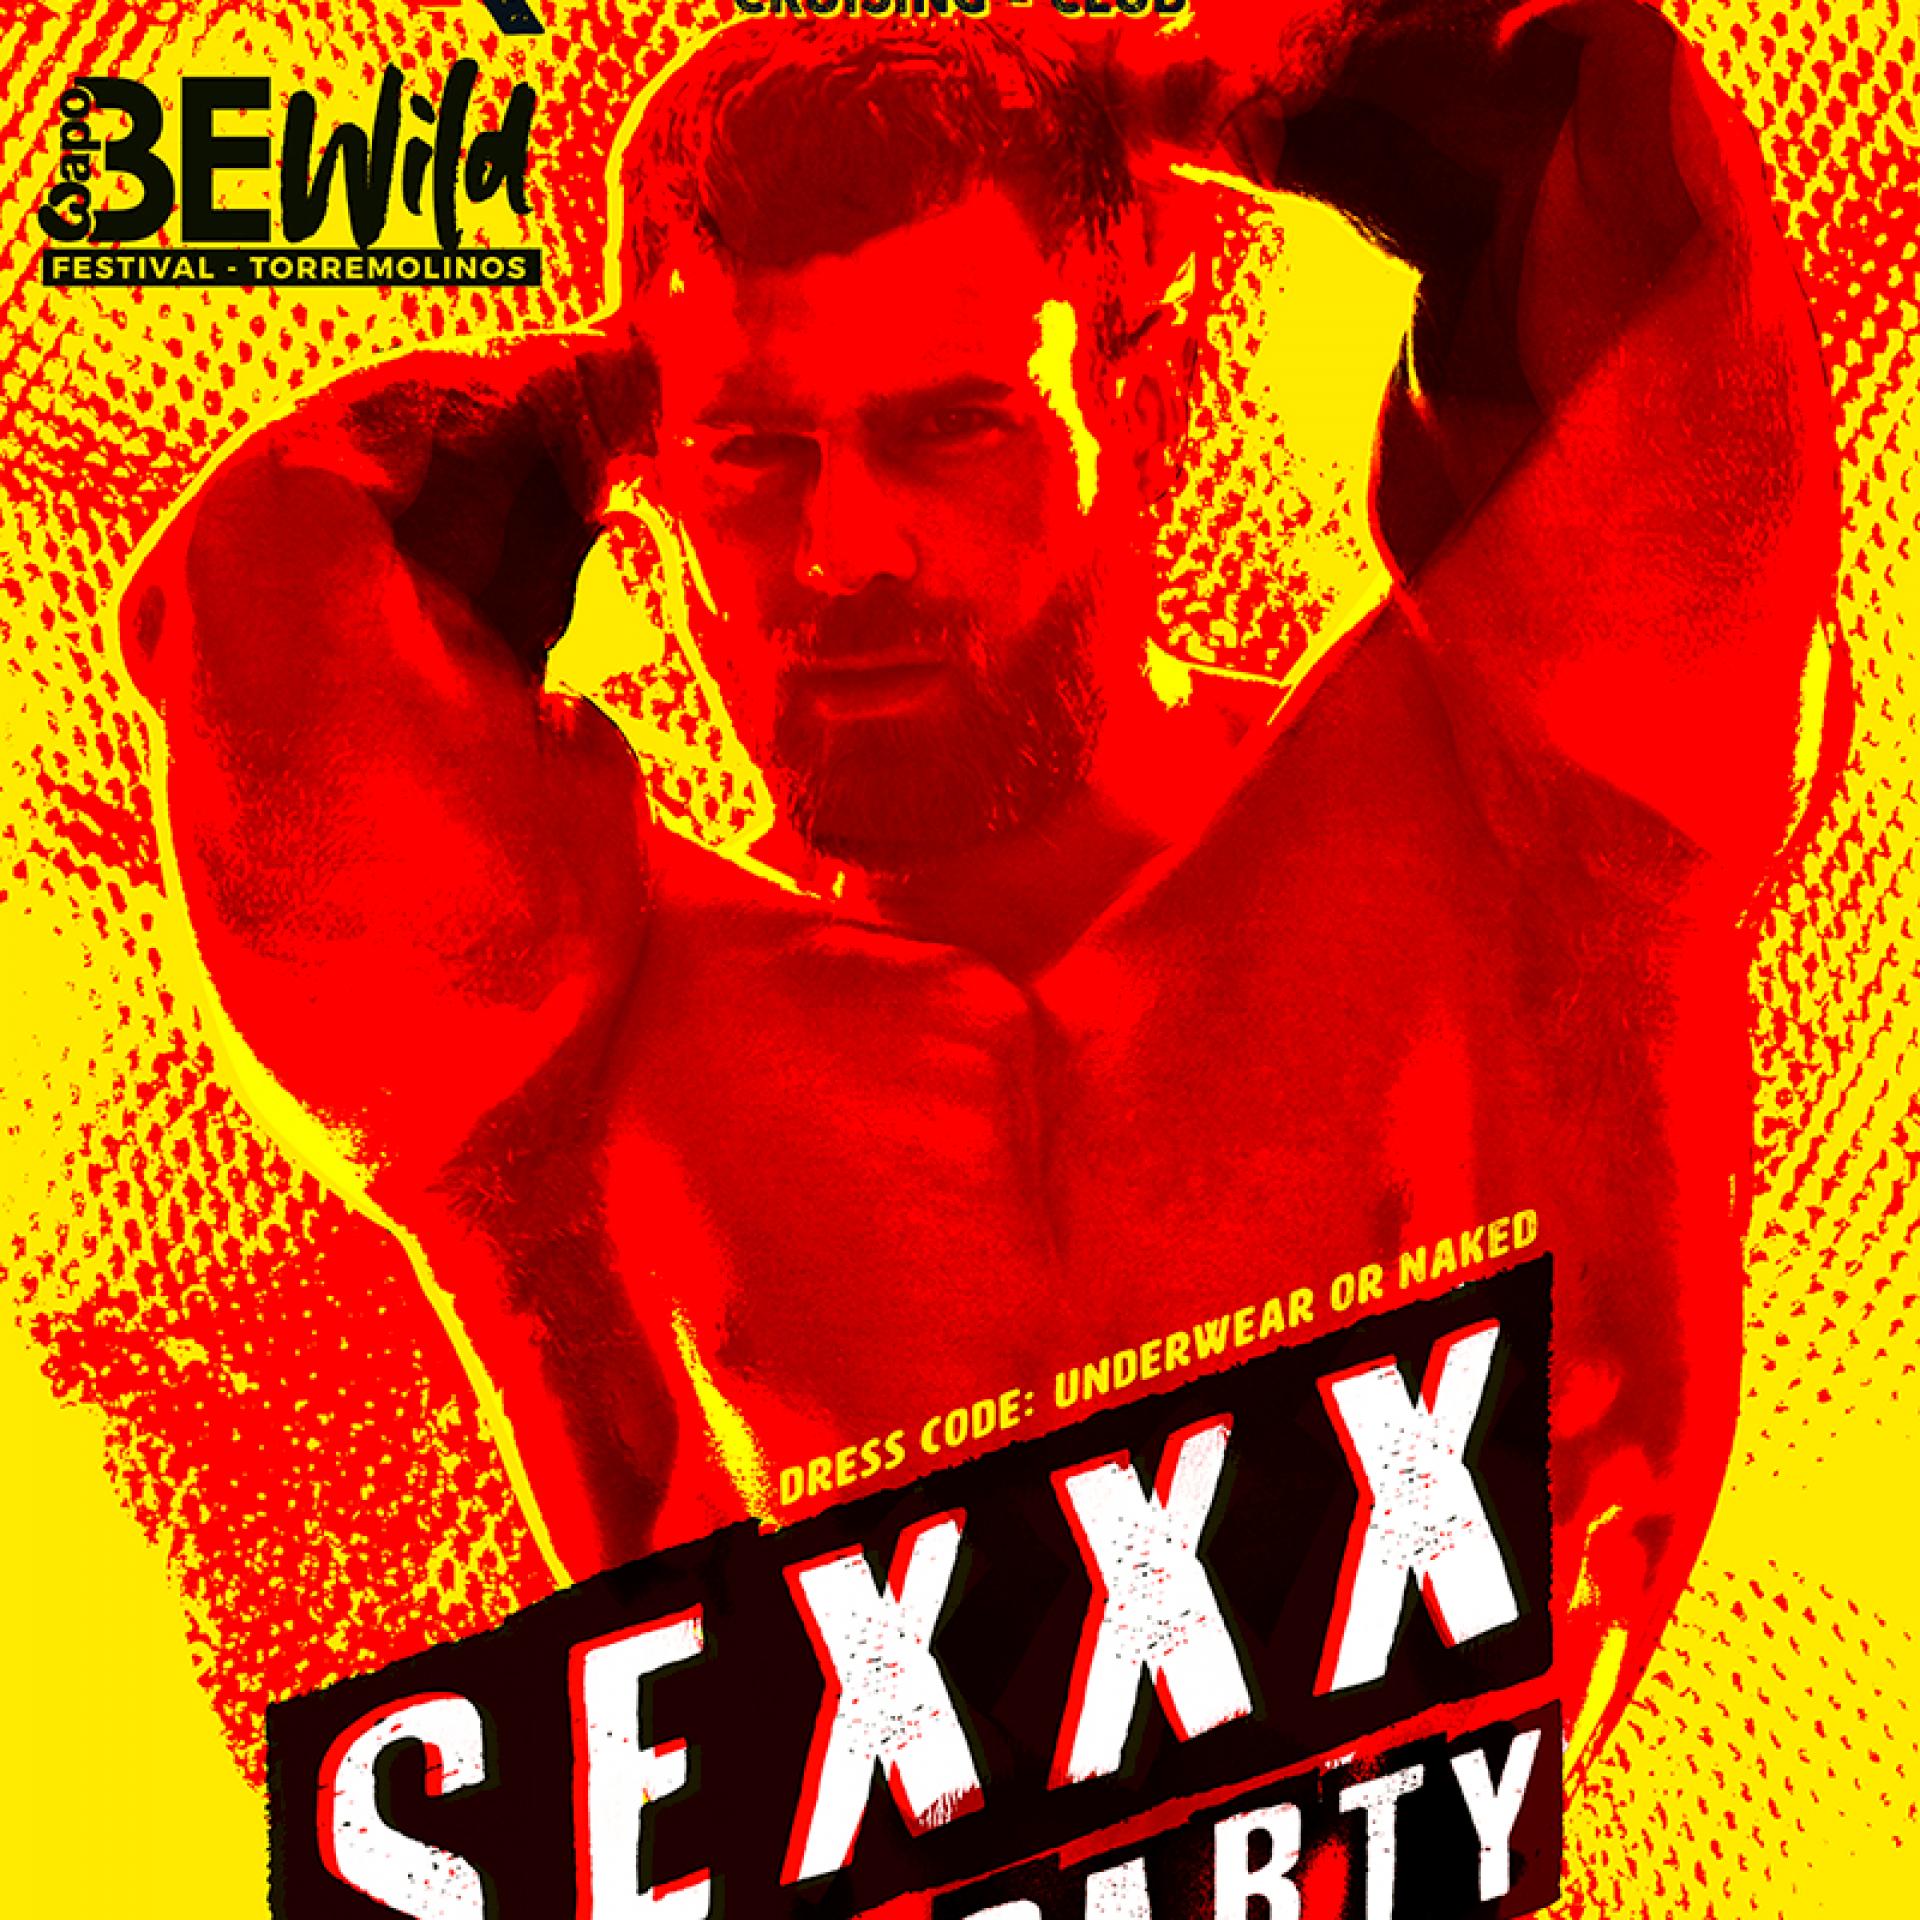 BeWild Sexxx Party en Exxxtreme